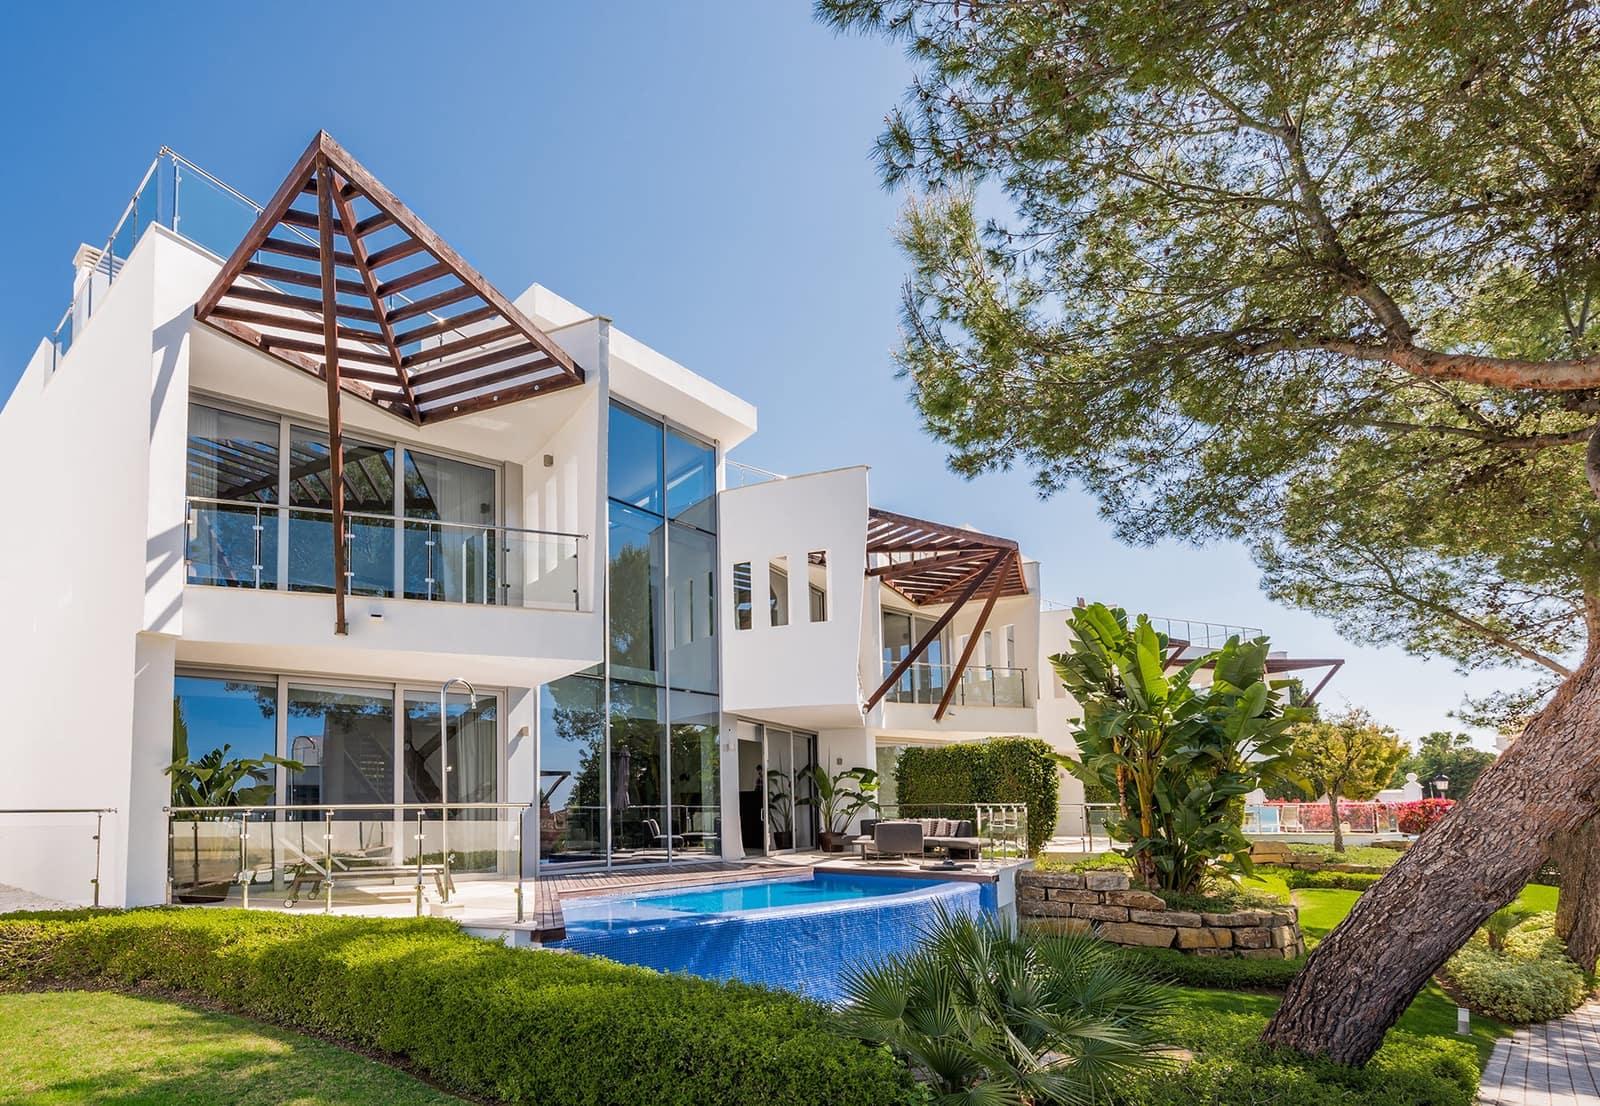 4 bedroom Semi-detached Villa for sale in Marbella with pool - € 1,904,000 (Ref: 5753303)